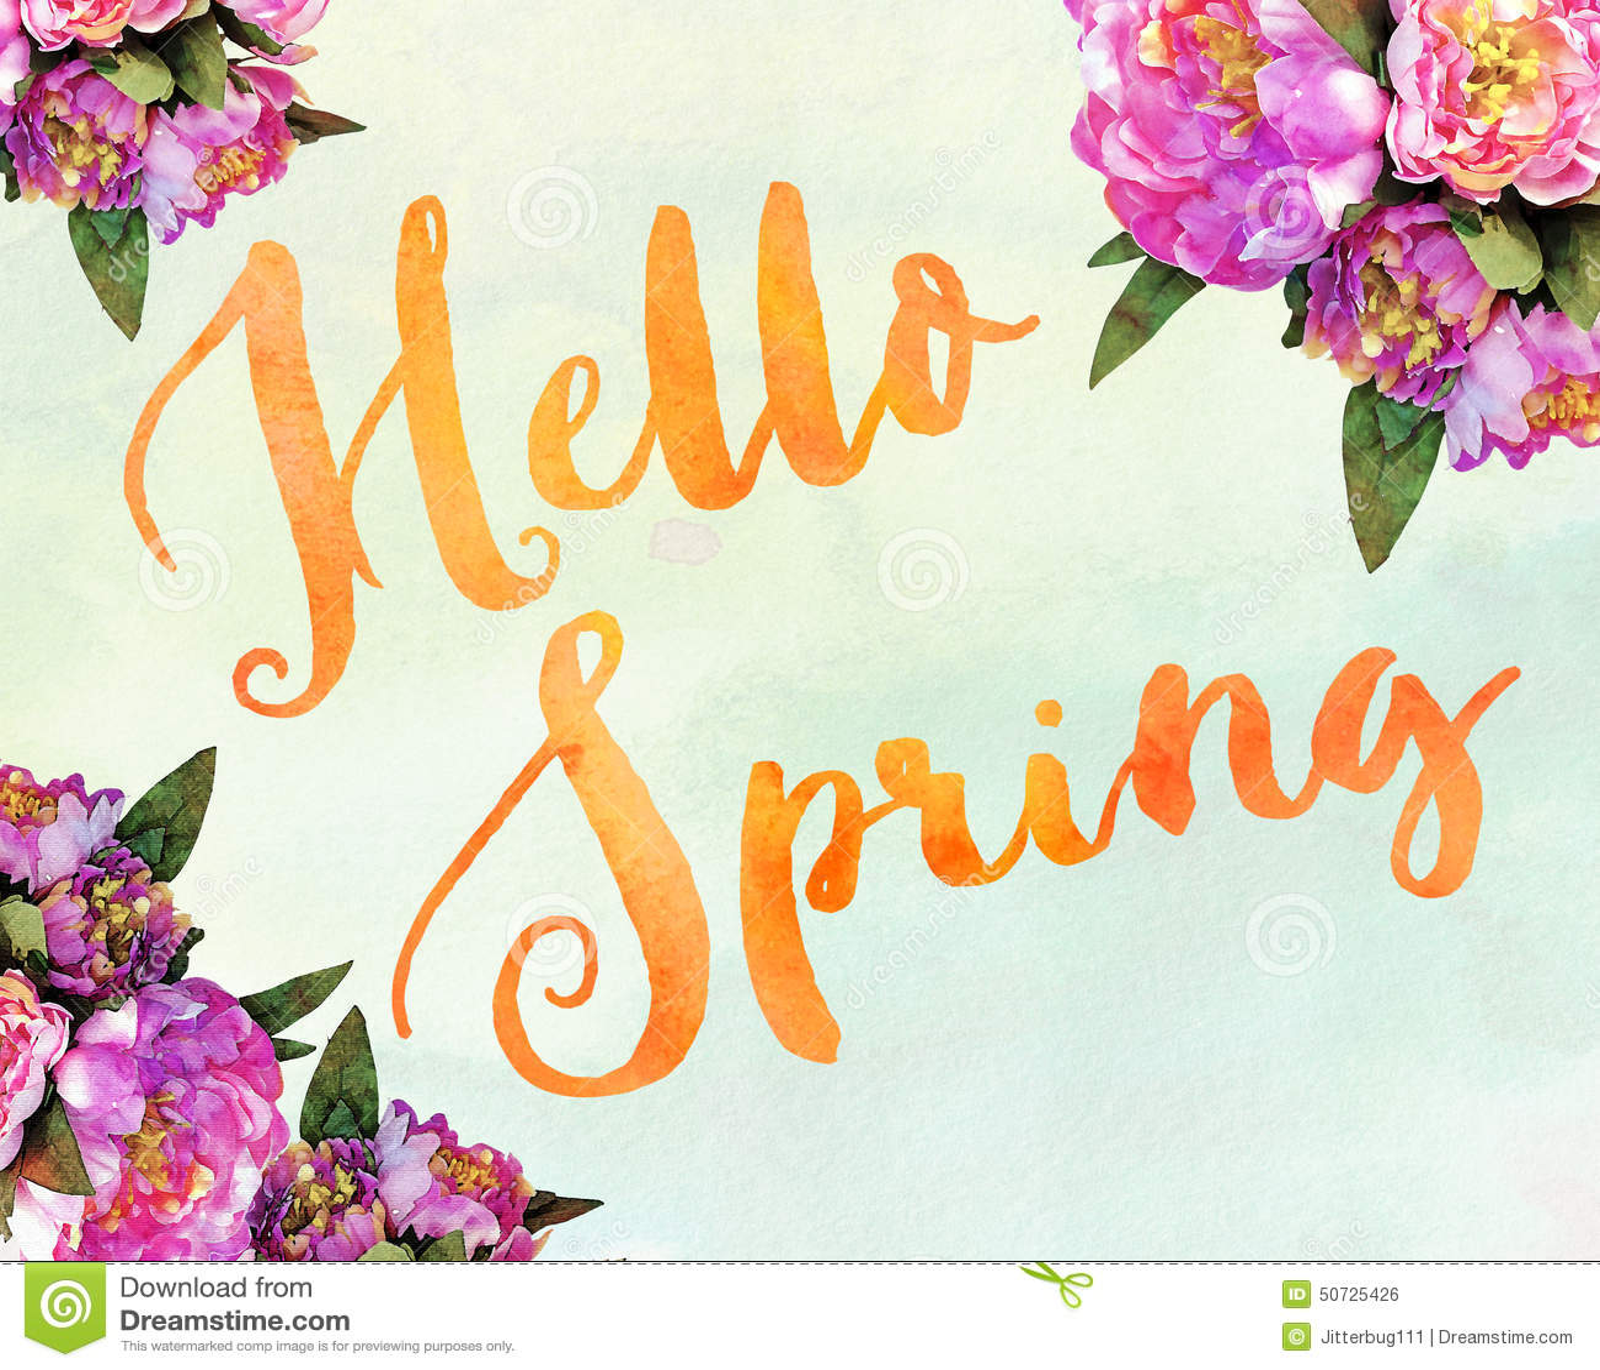 Hamsa Iphone Wallpaper Hello Spring Stock Illustration Illustration Of Card